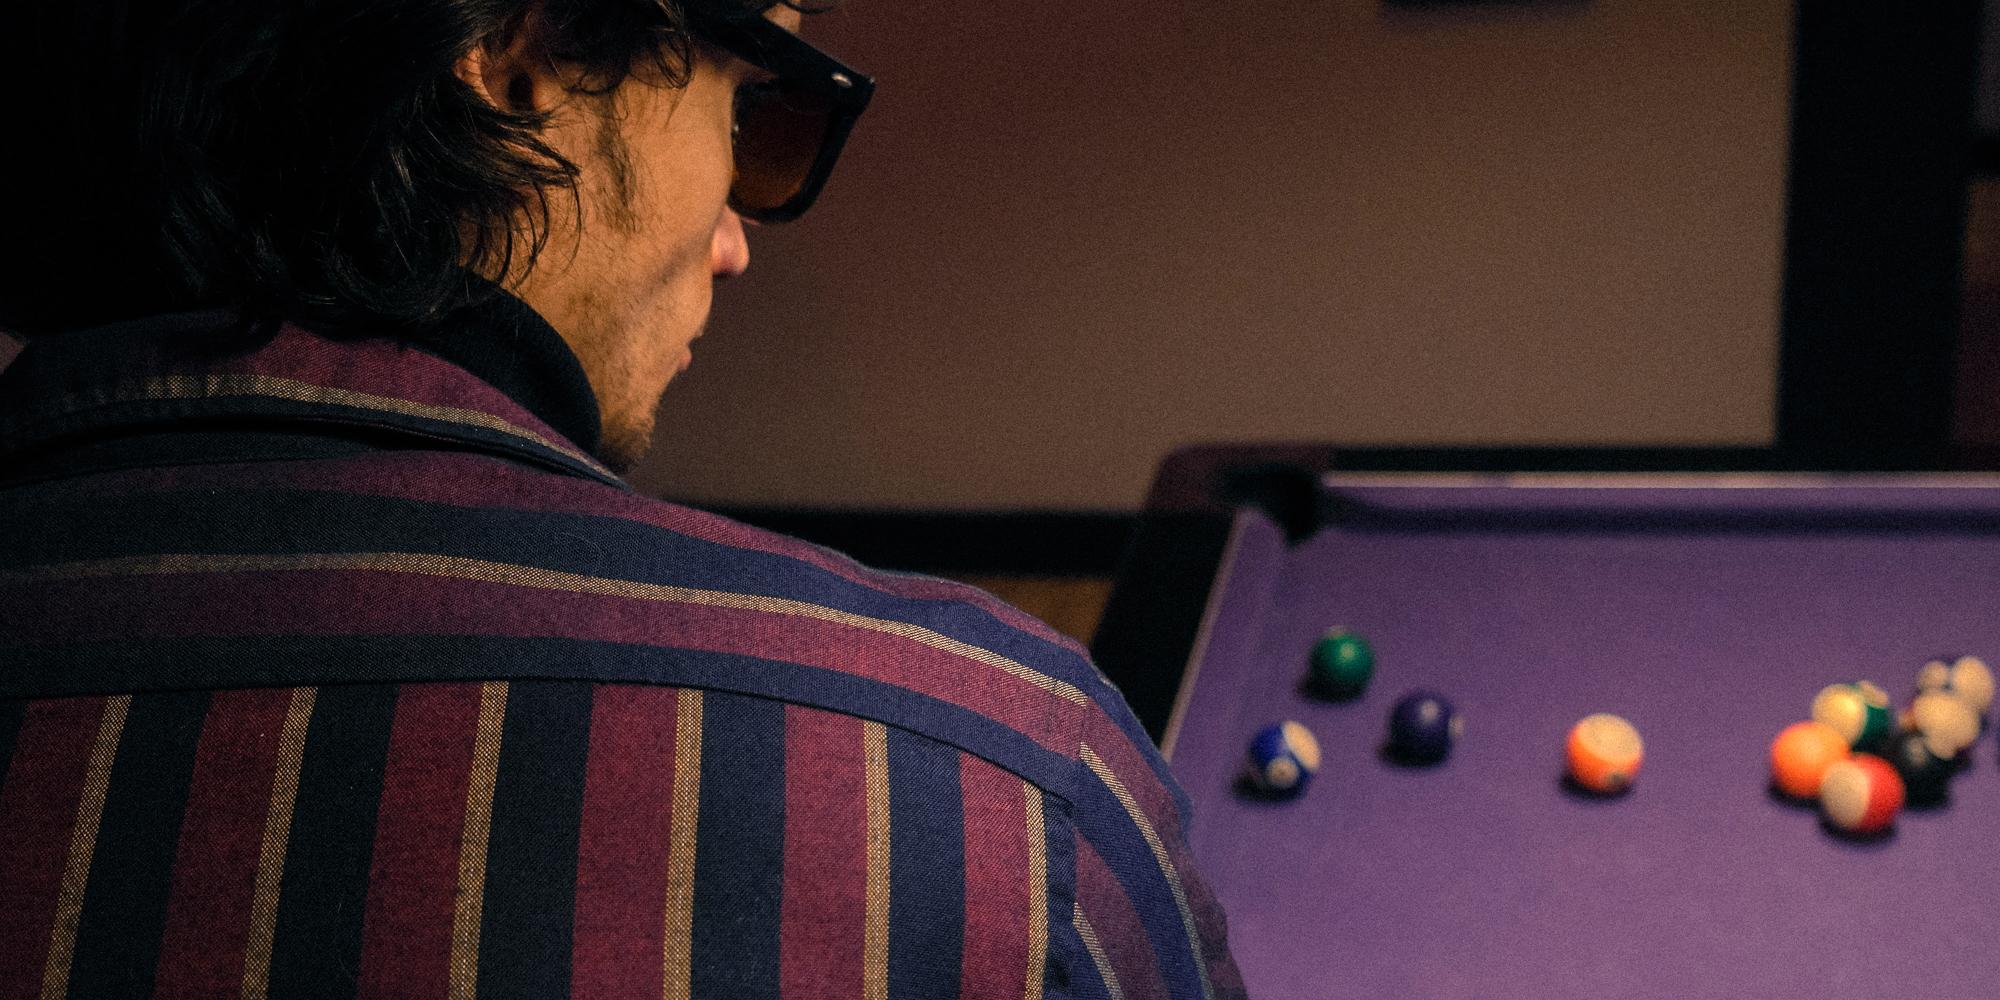 Bowling, billard, boating, la chemise week-end très casual!